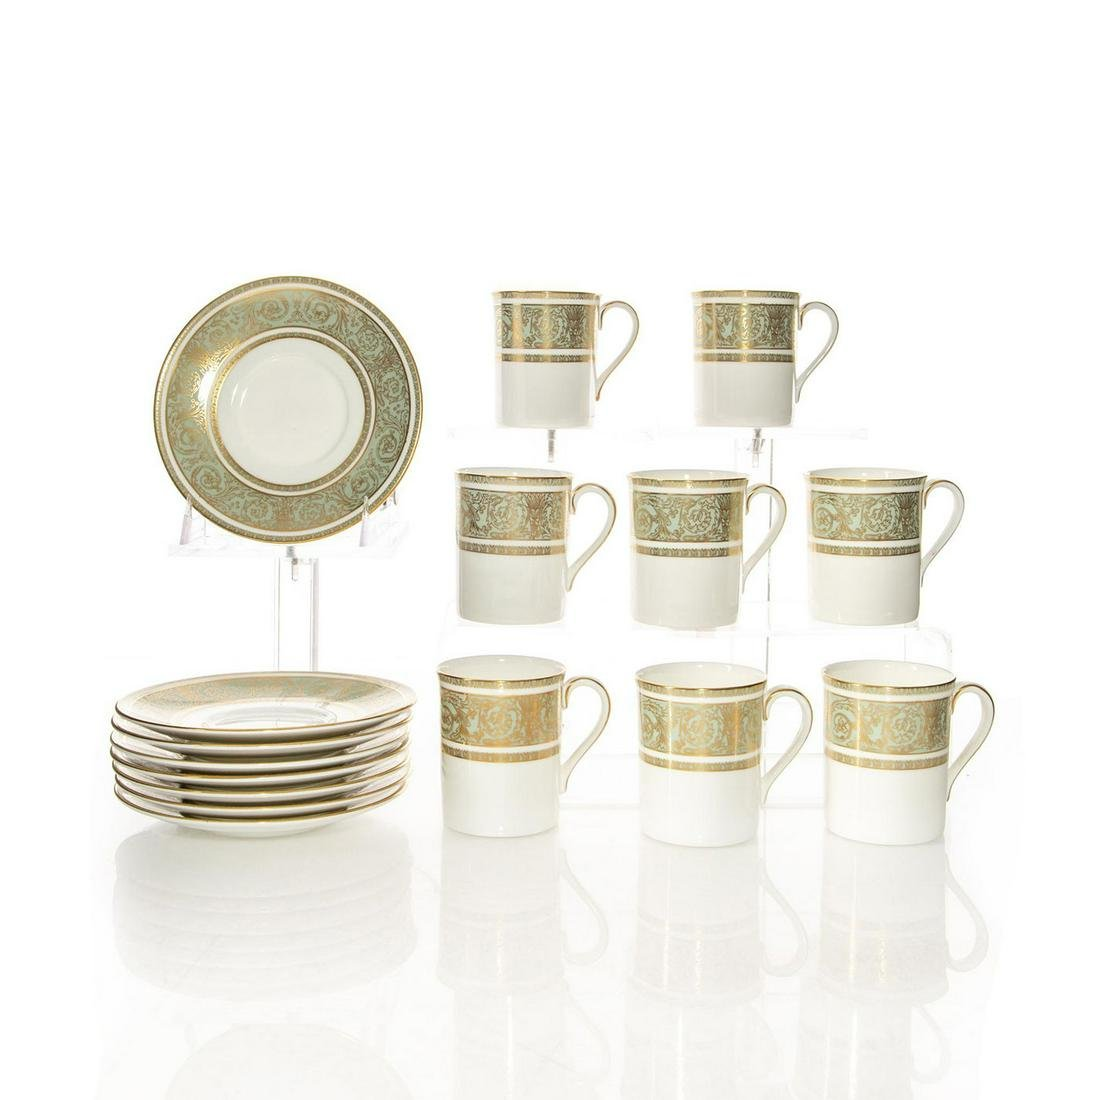 8 ROYAL DOULTON ENGLISH RENAISSANCE COFFEE CUPS,